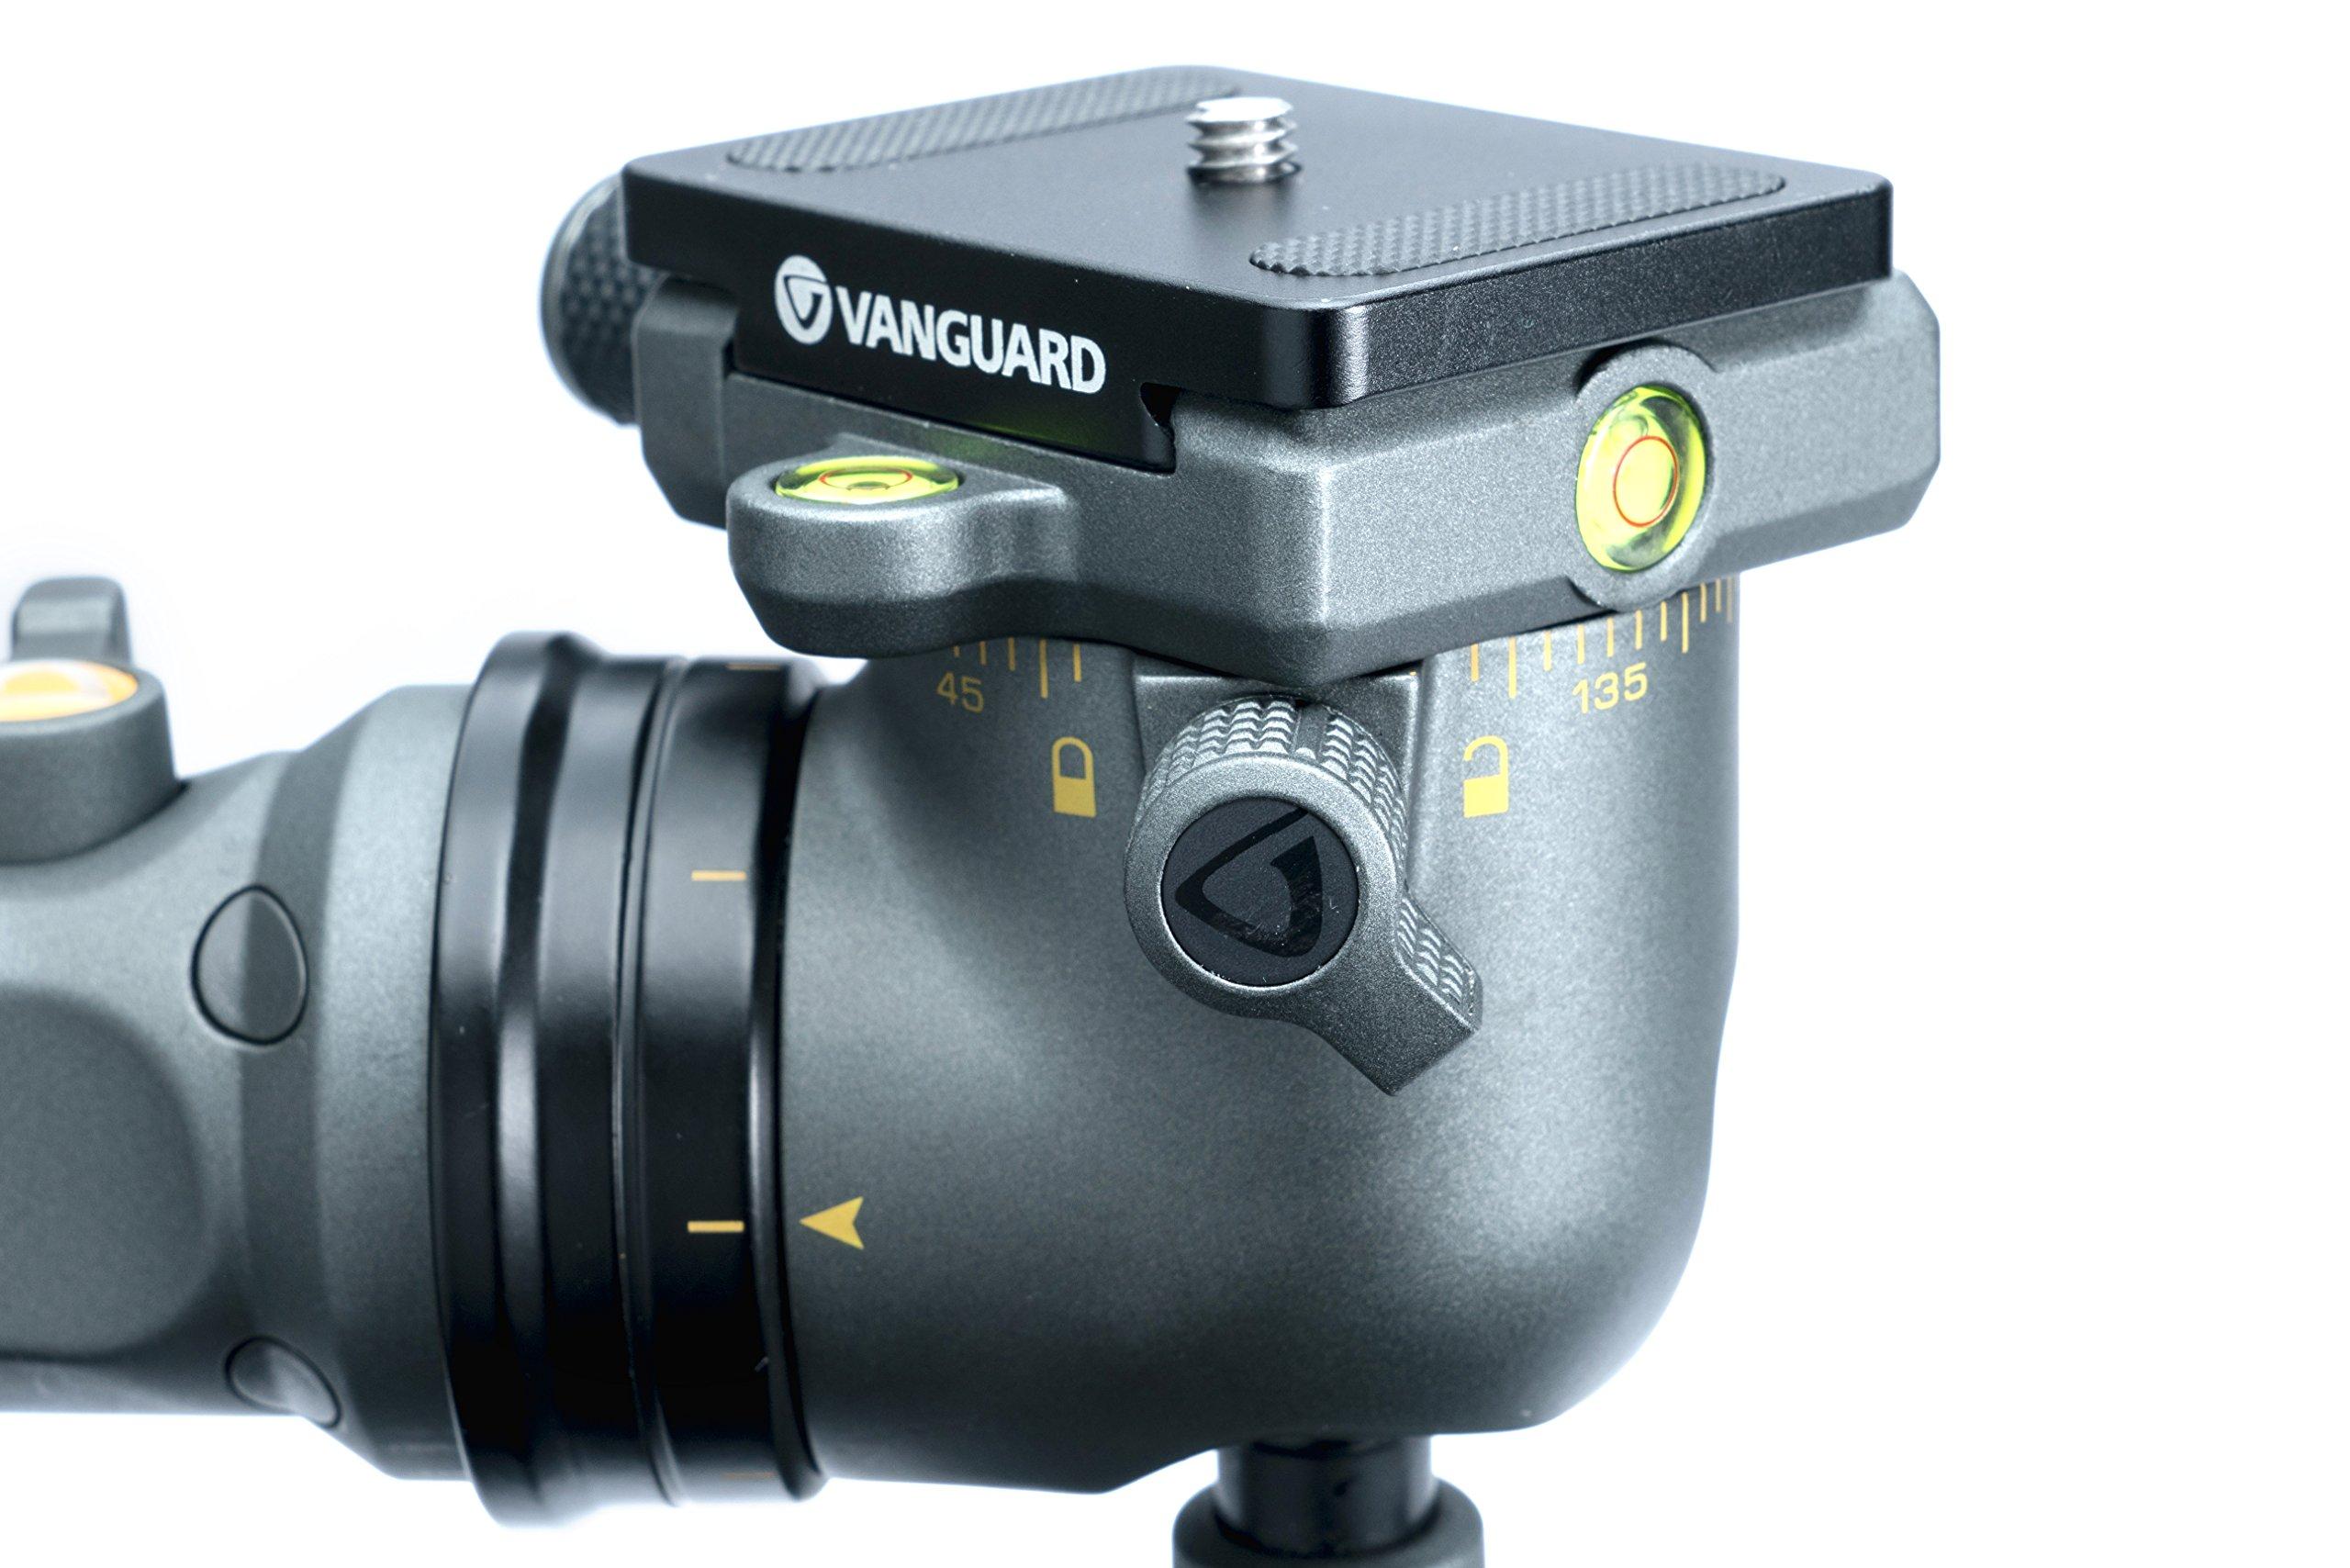 Vanguard ALTA Grip Tripod Head, Gray (ALTA GH-300T) by Vanguard (Image #5)